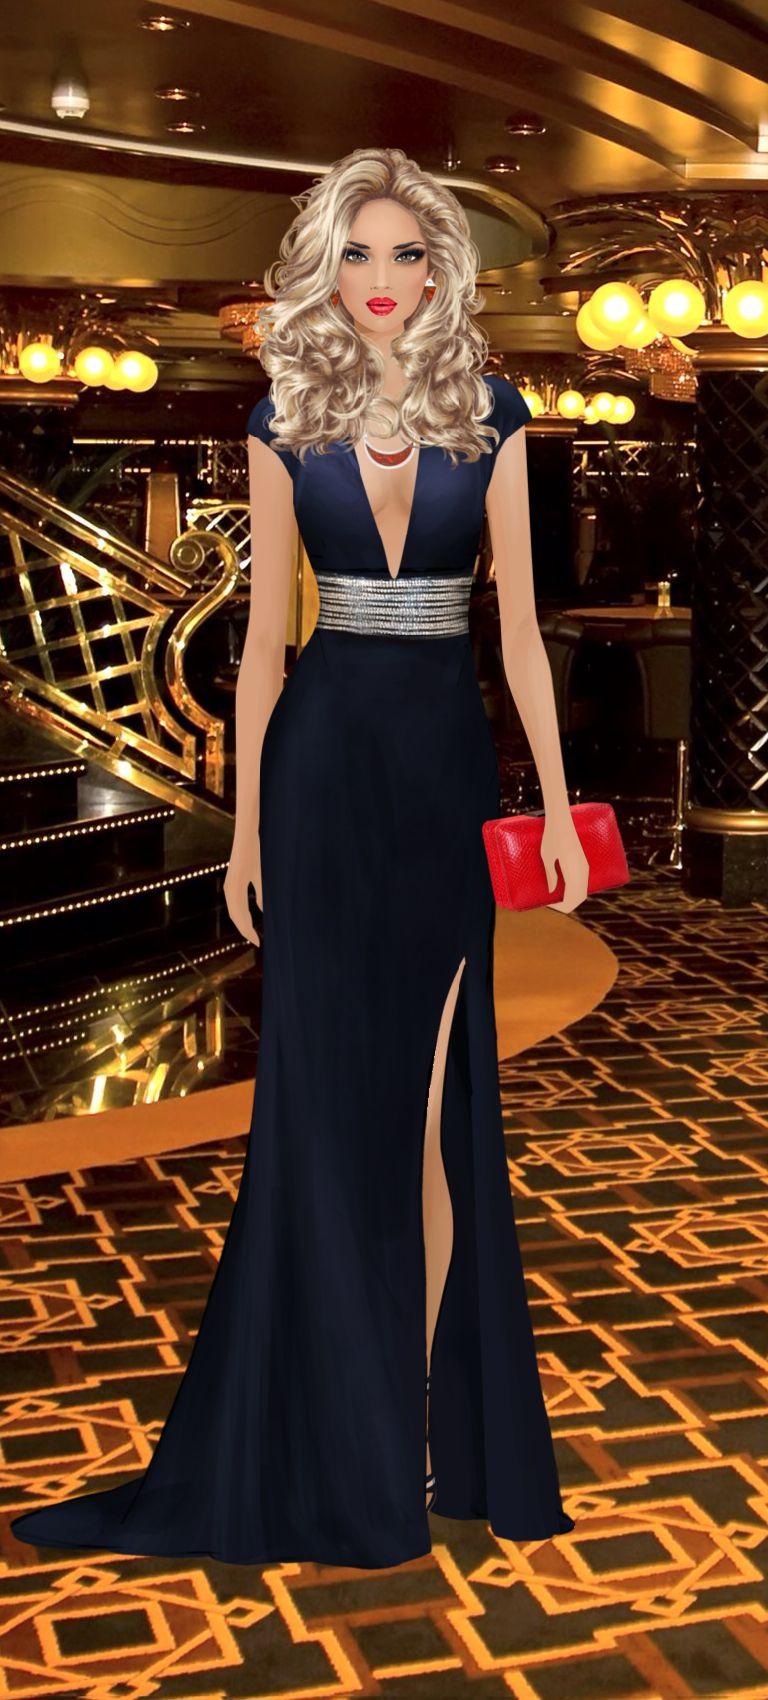 Monte Carlo Casino Party | Vestidos, Bonecas de moda e